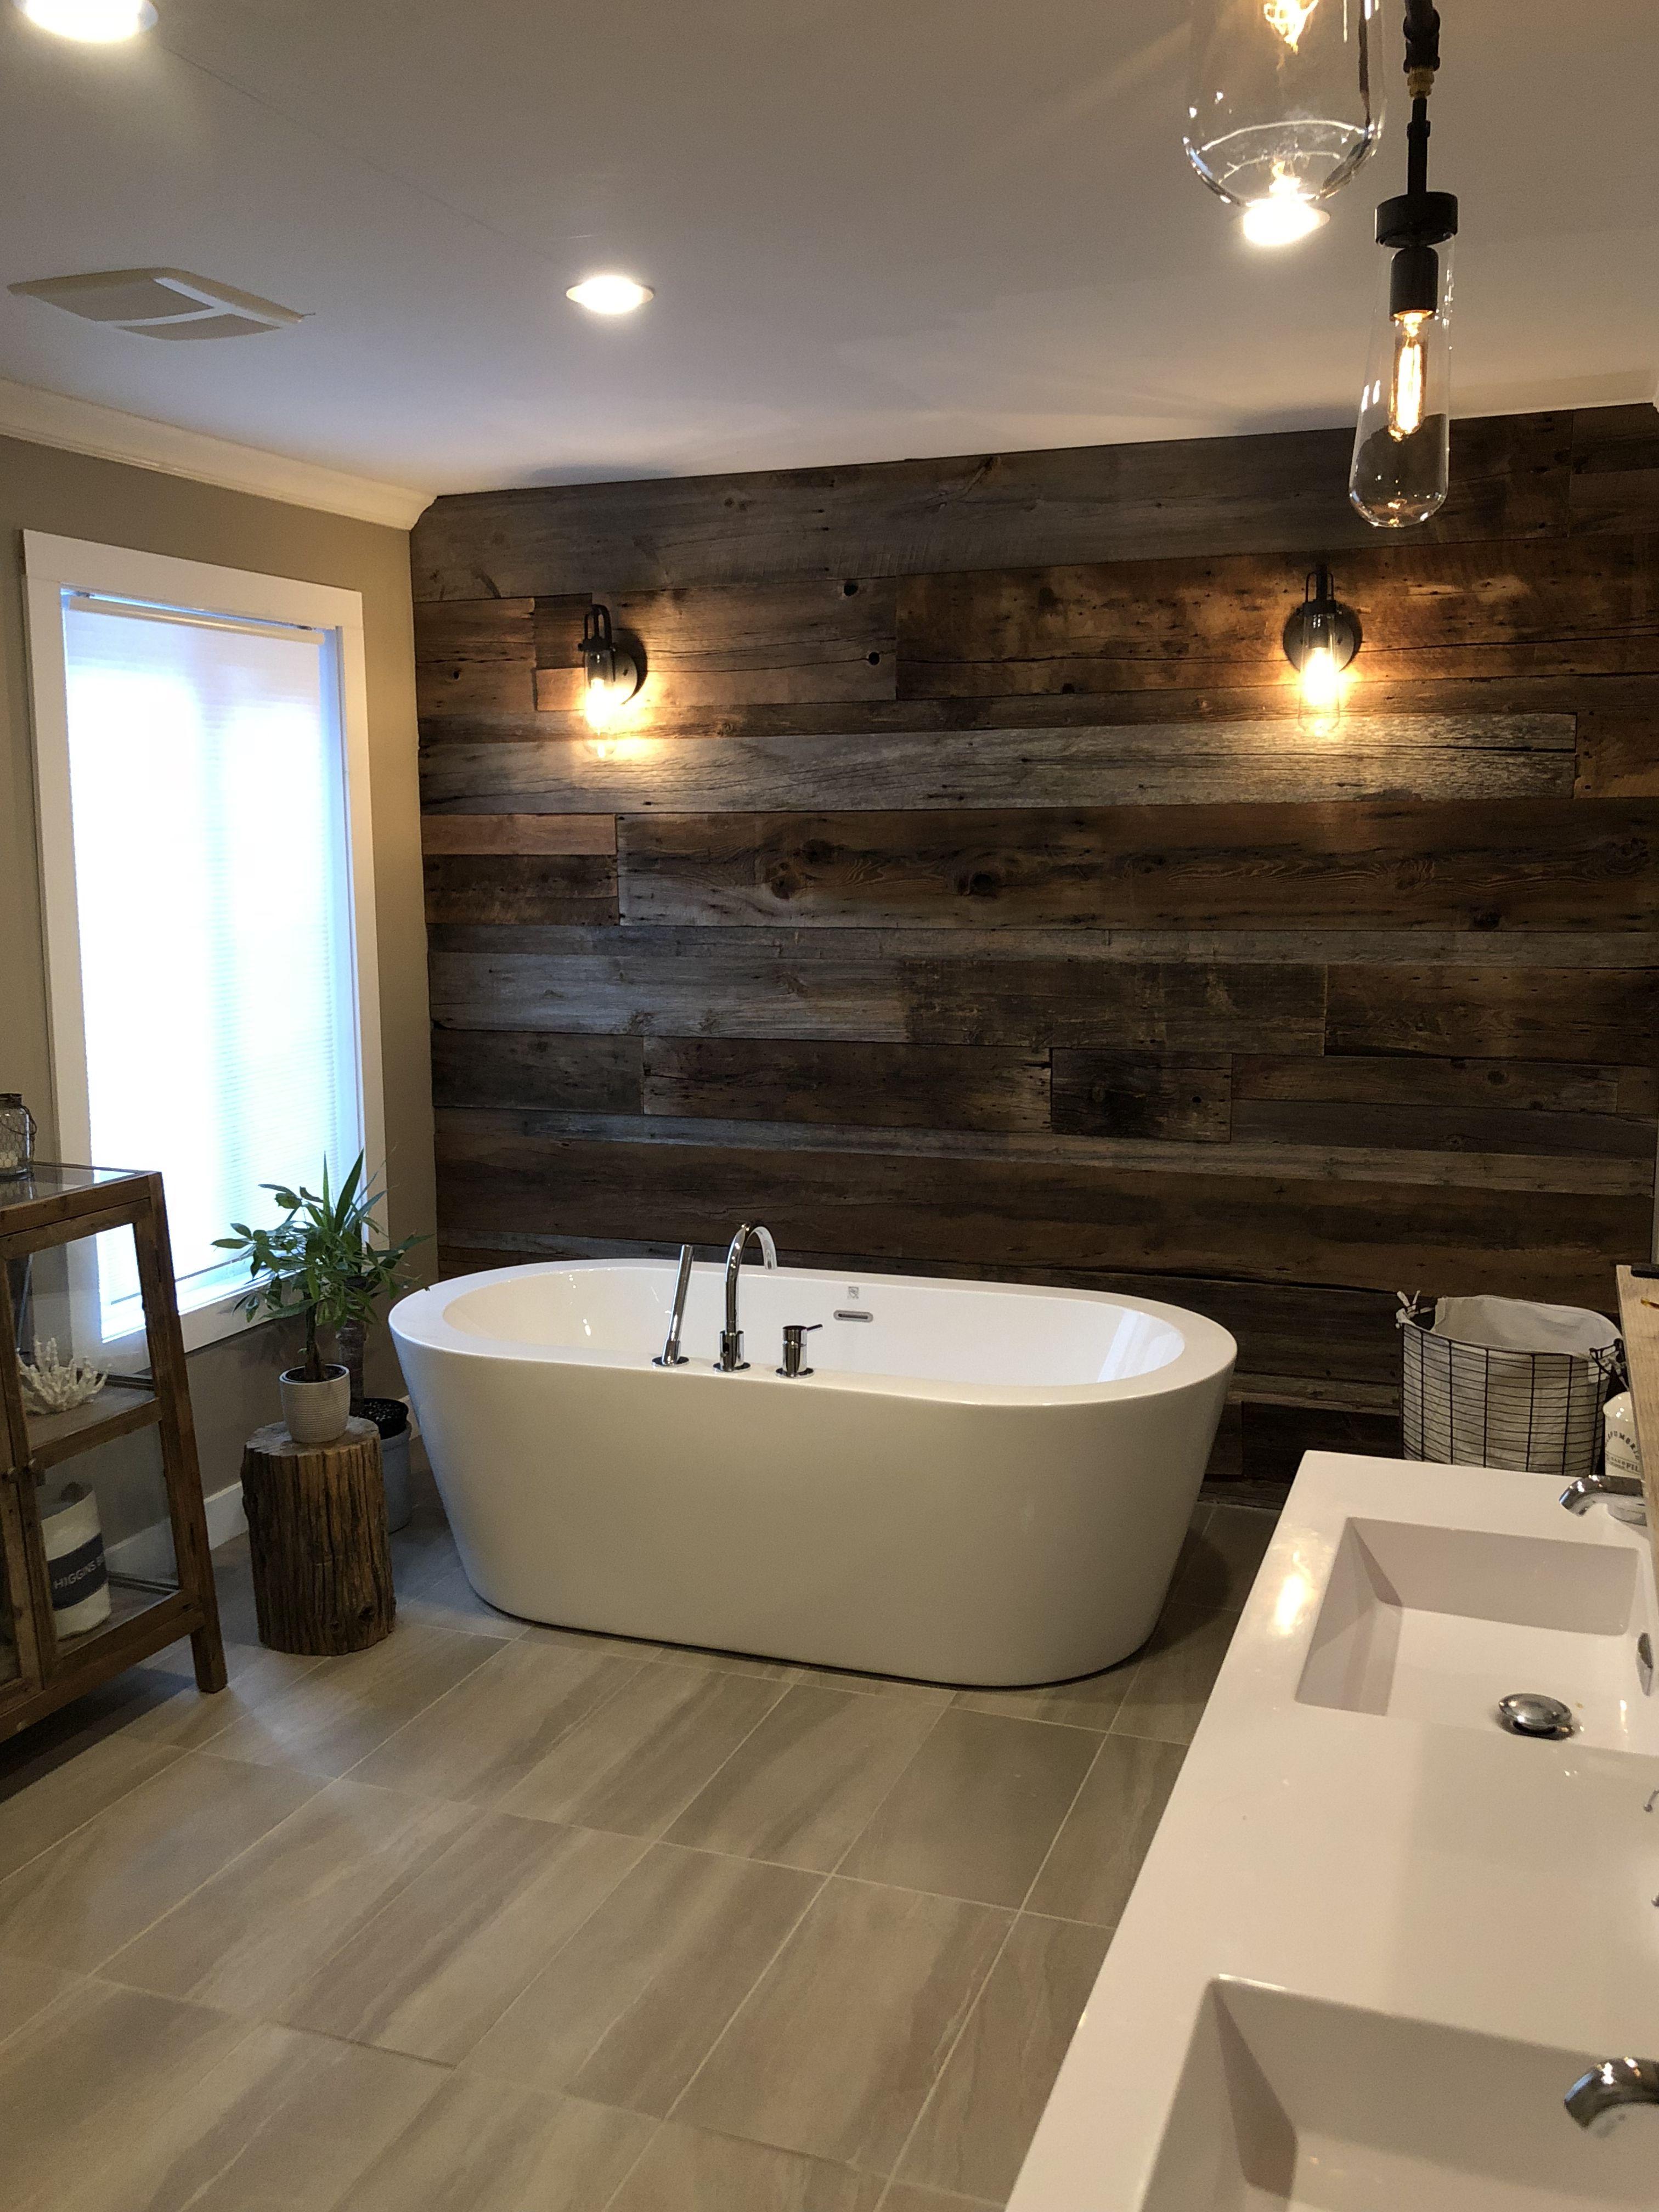 pin by amber harris on new house stand alone bathtubs on bathroom renovation ideas australia id=60370